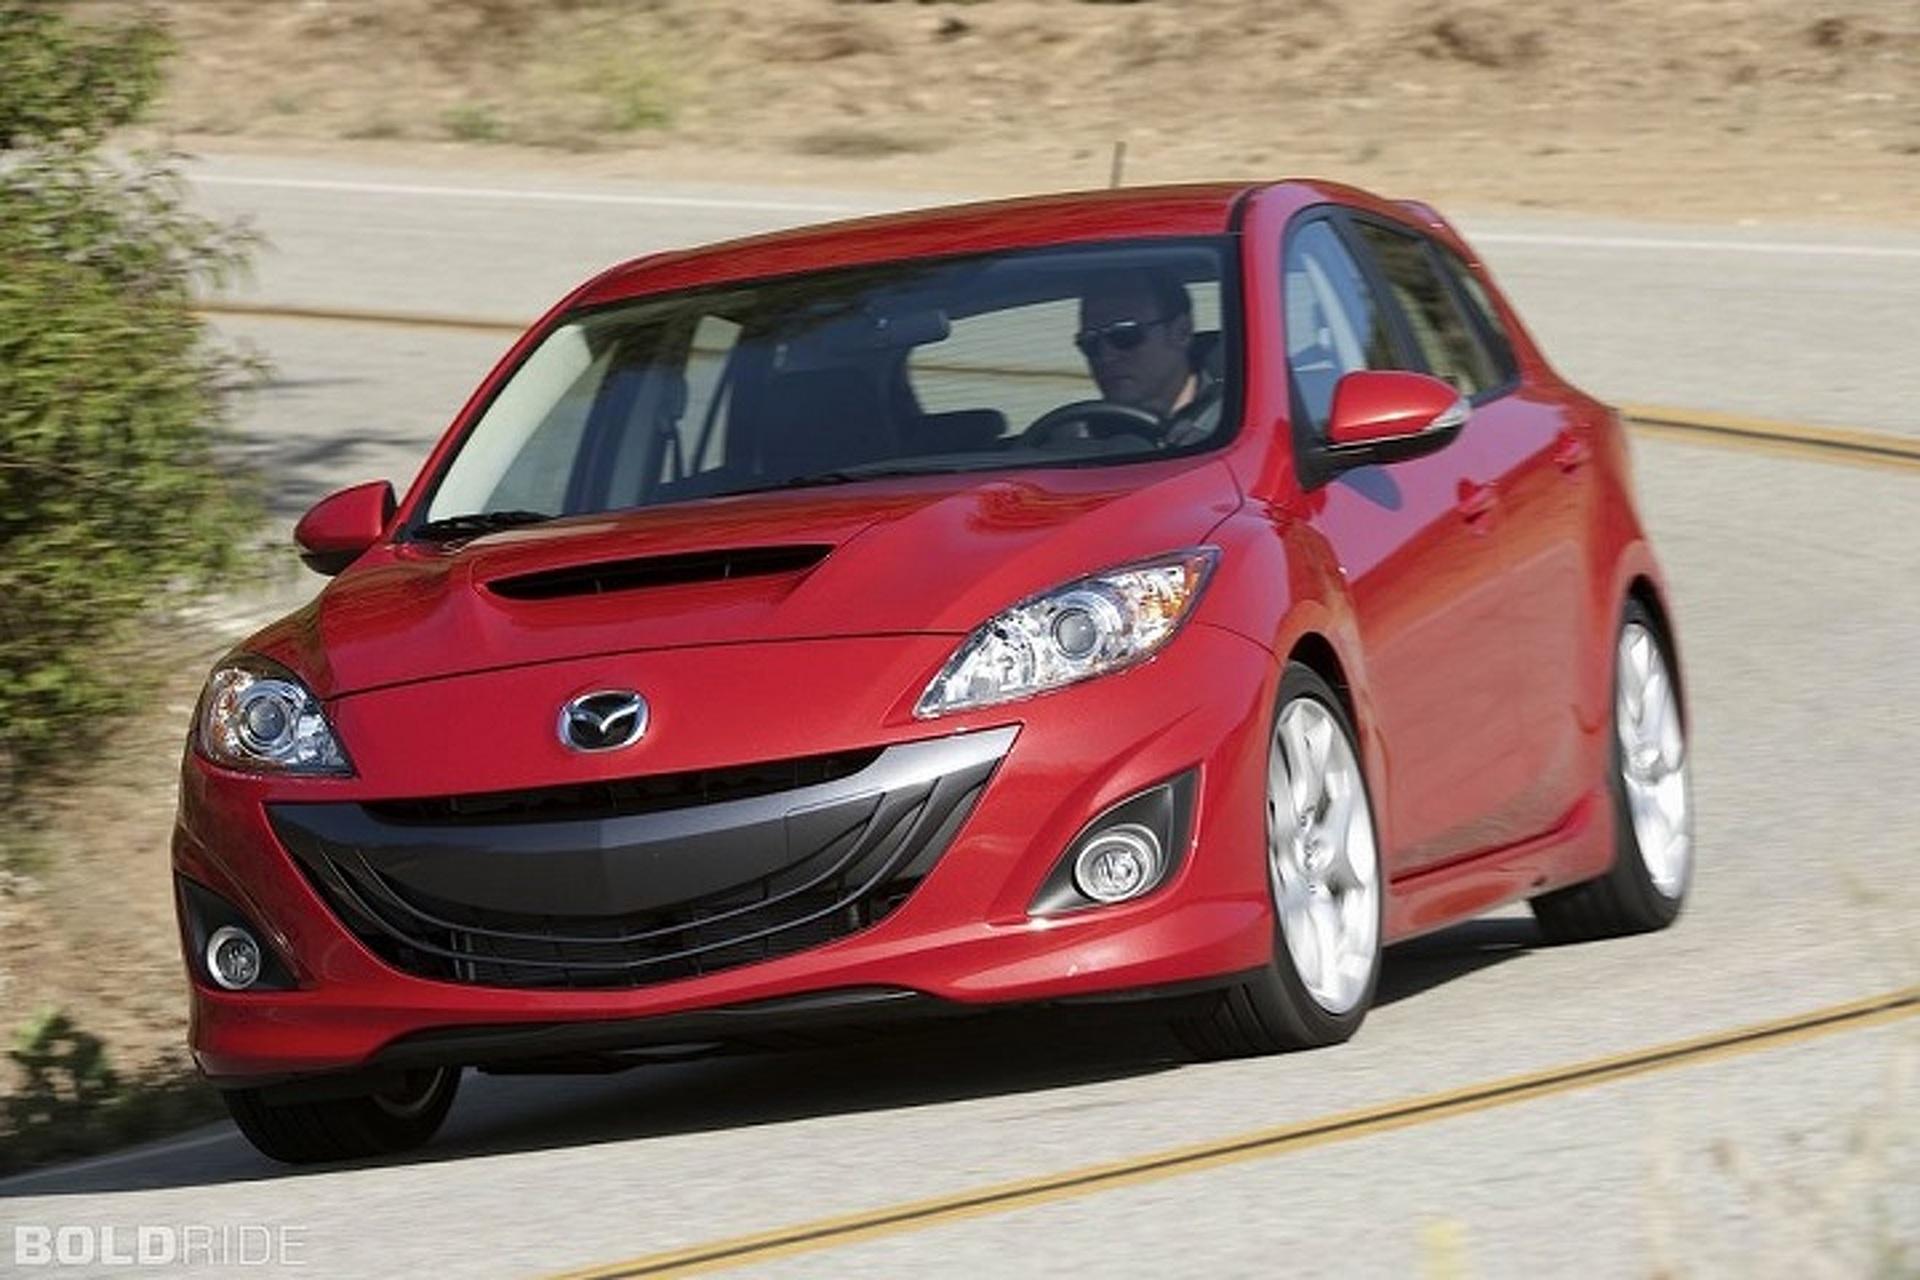 Mazdaspeed3 Return Closer Than You Think